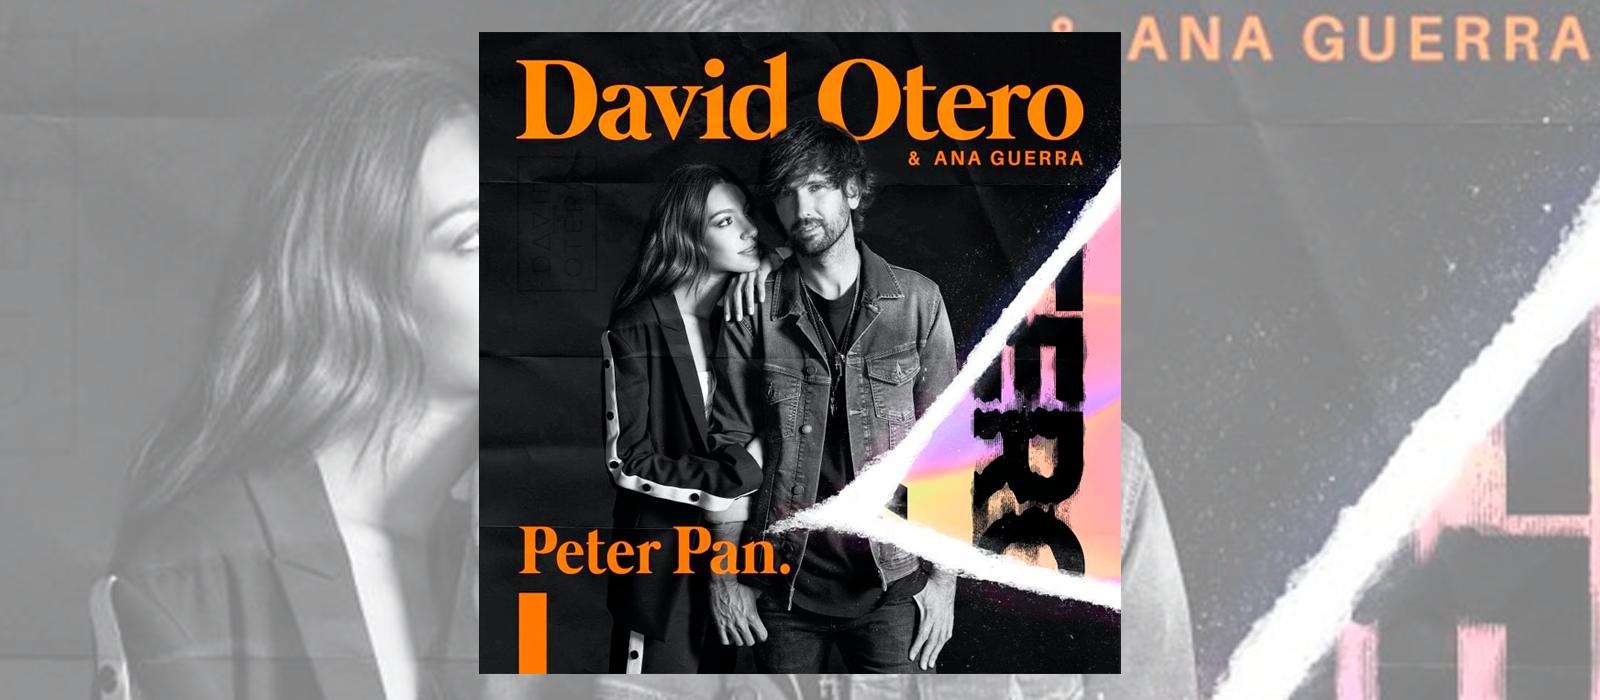 David Otero reedita 'Peter Pan' junto a Ana Guerra